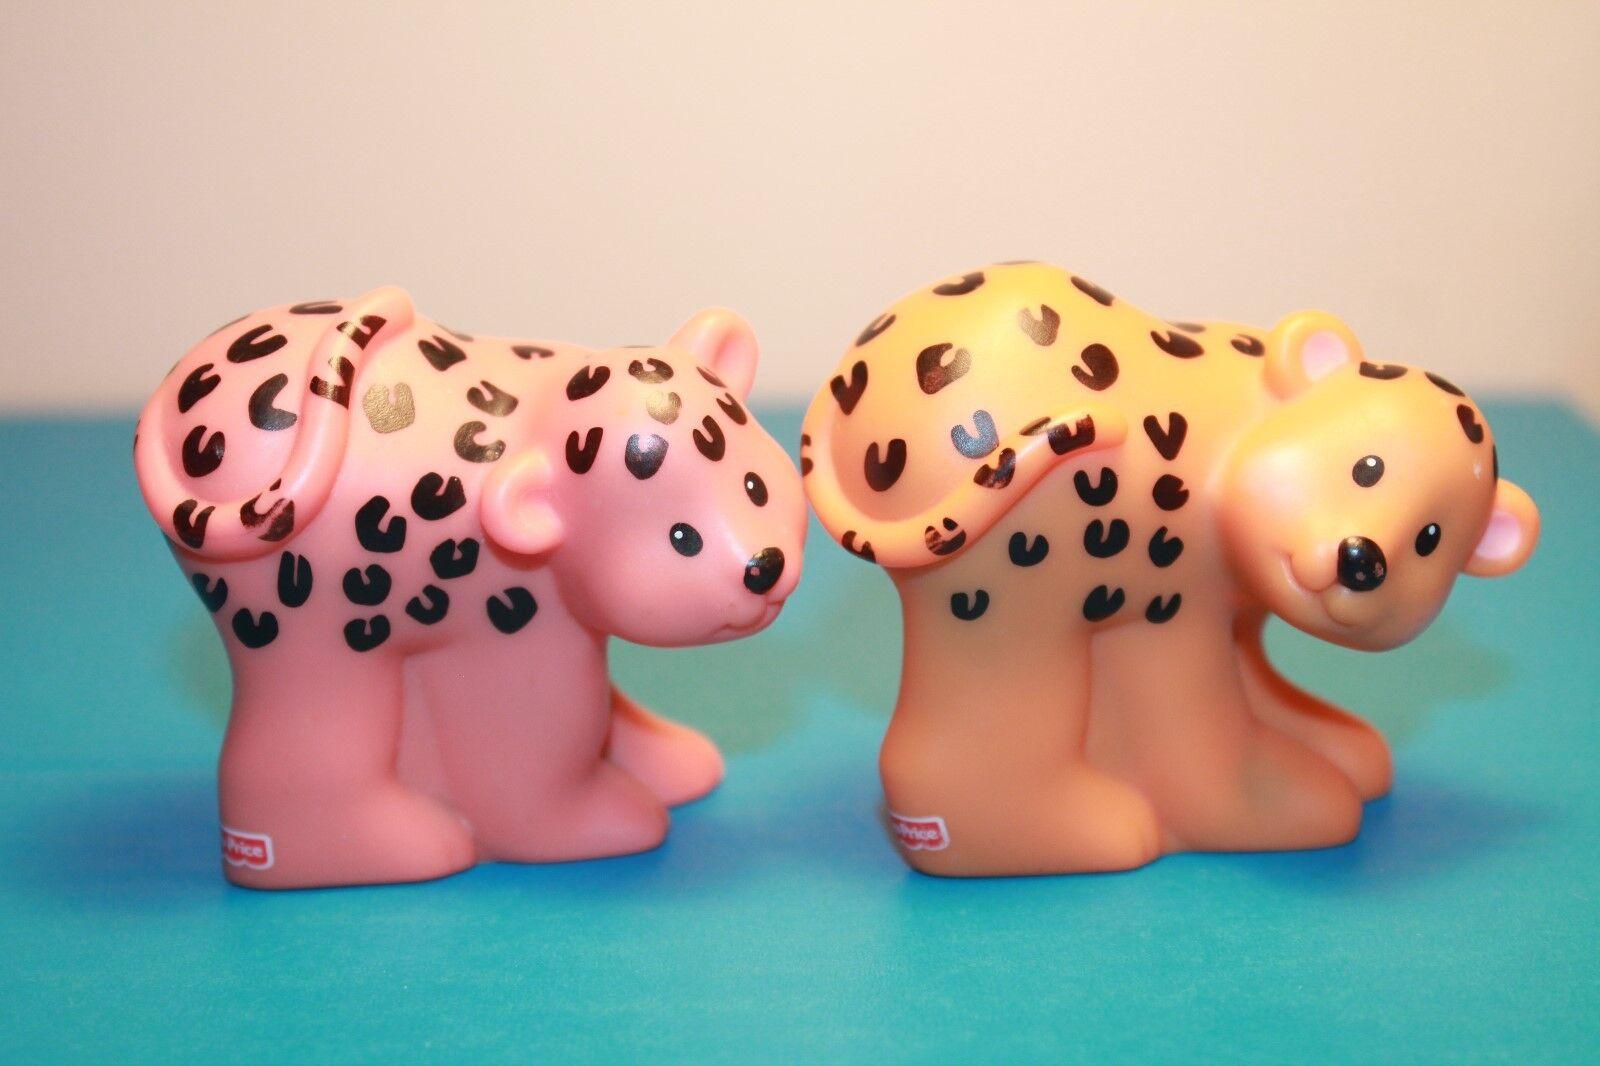 Little People Fisher Price Mattel Noah's Ark Leopard Cheetah Toy Figures Pretend